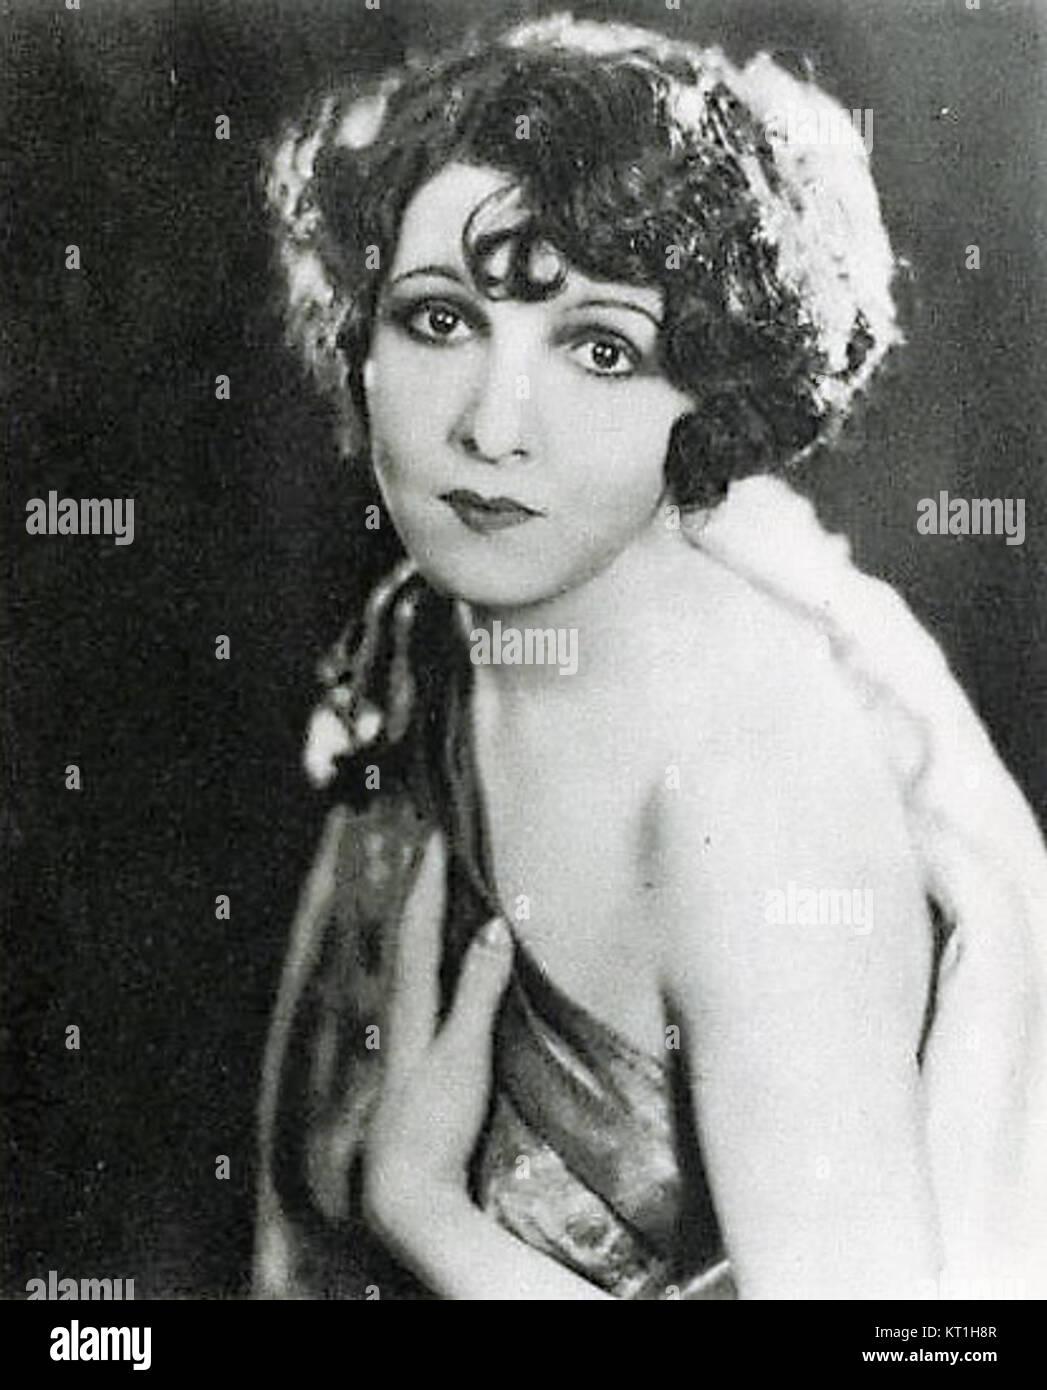 Carmelita Geraghty